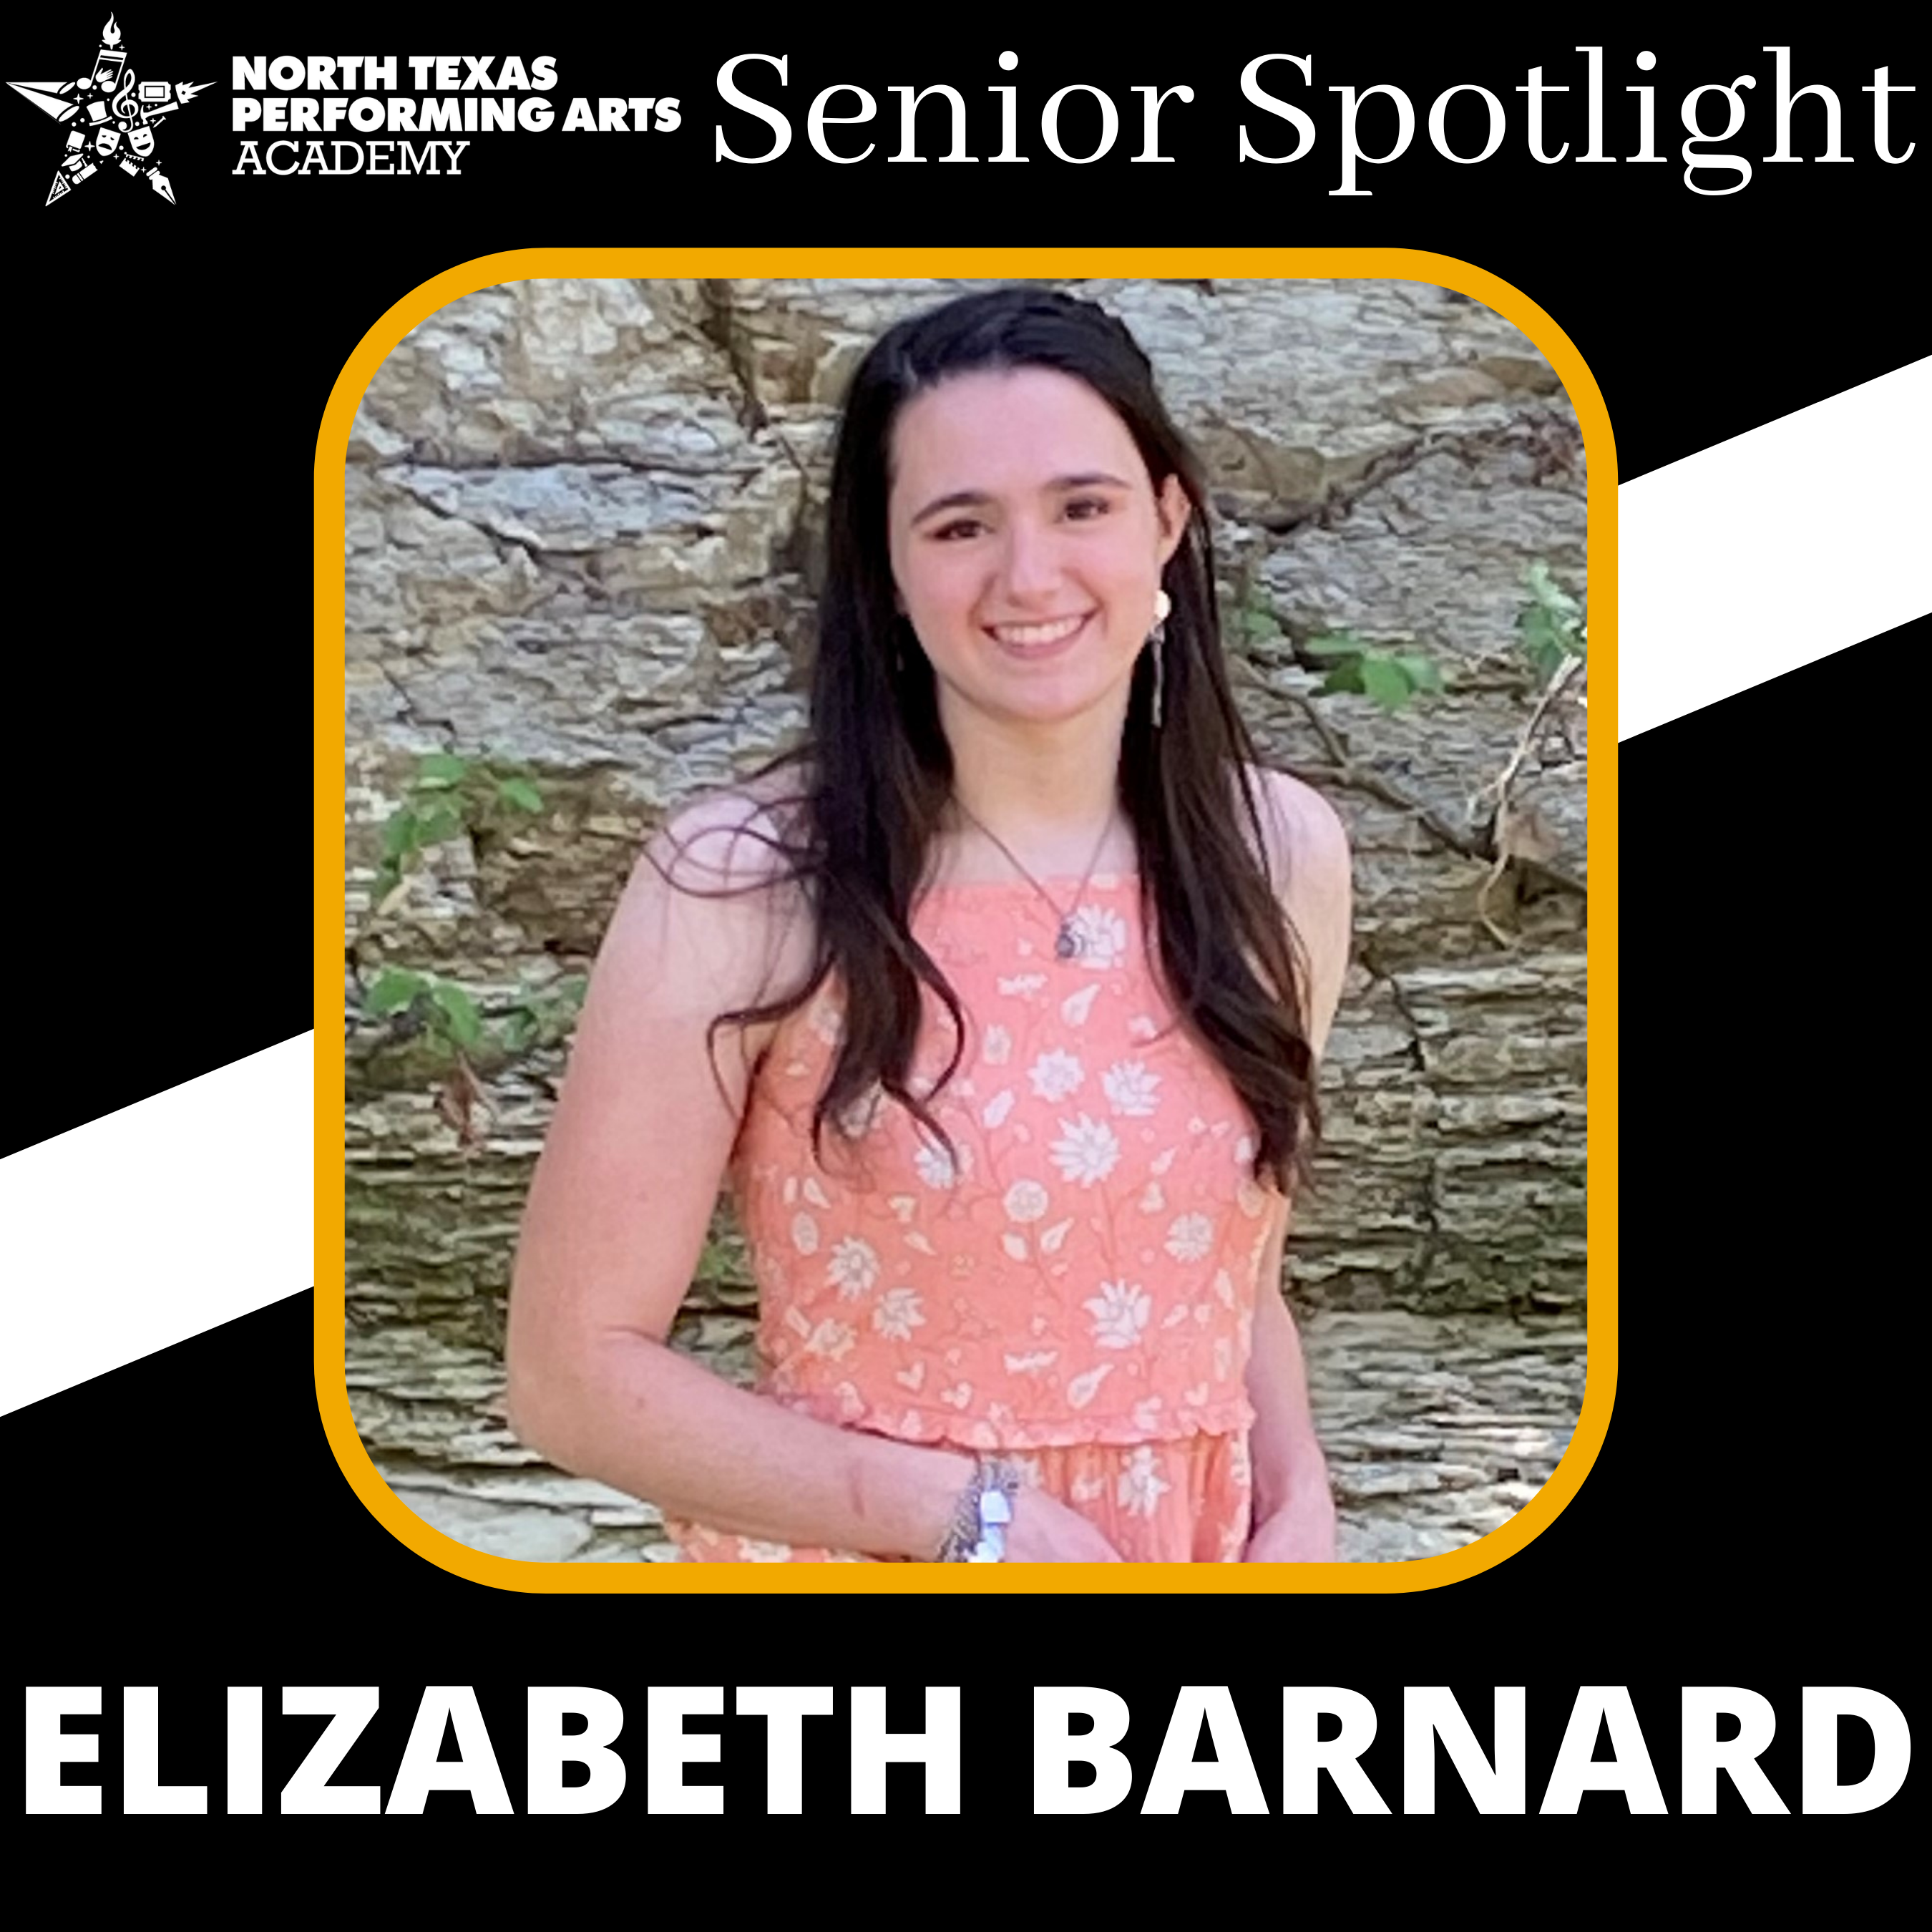 Elizabeth Barnard headshot